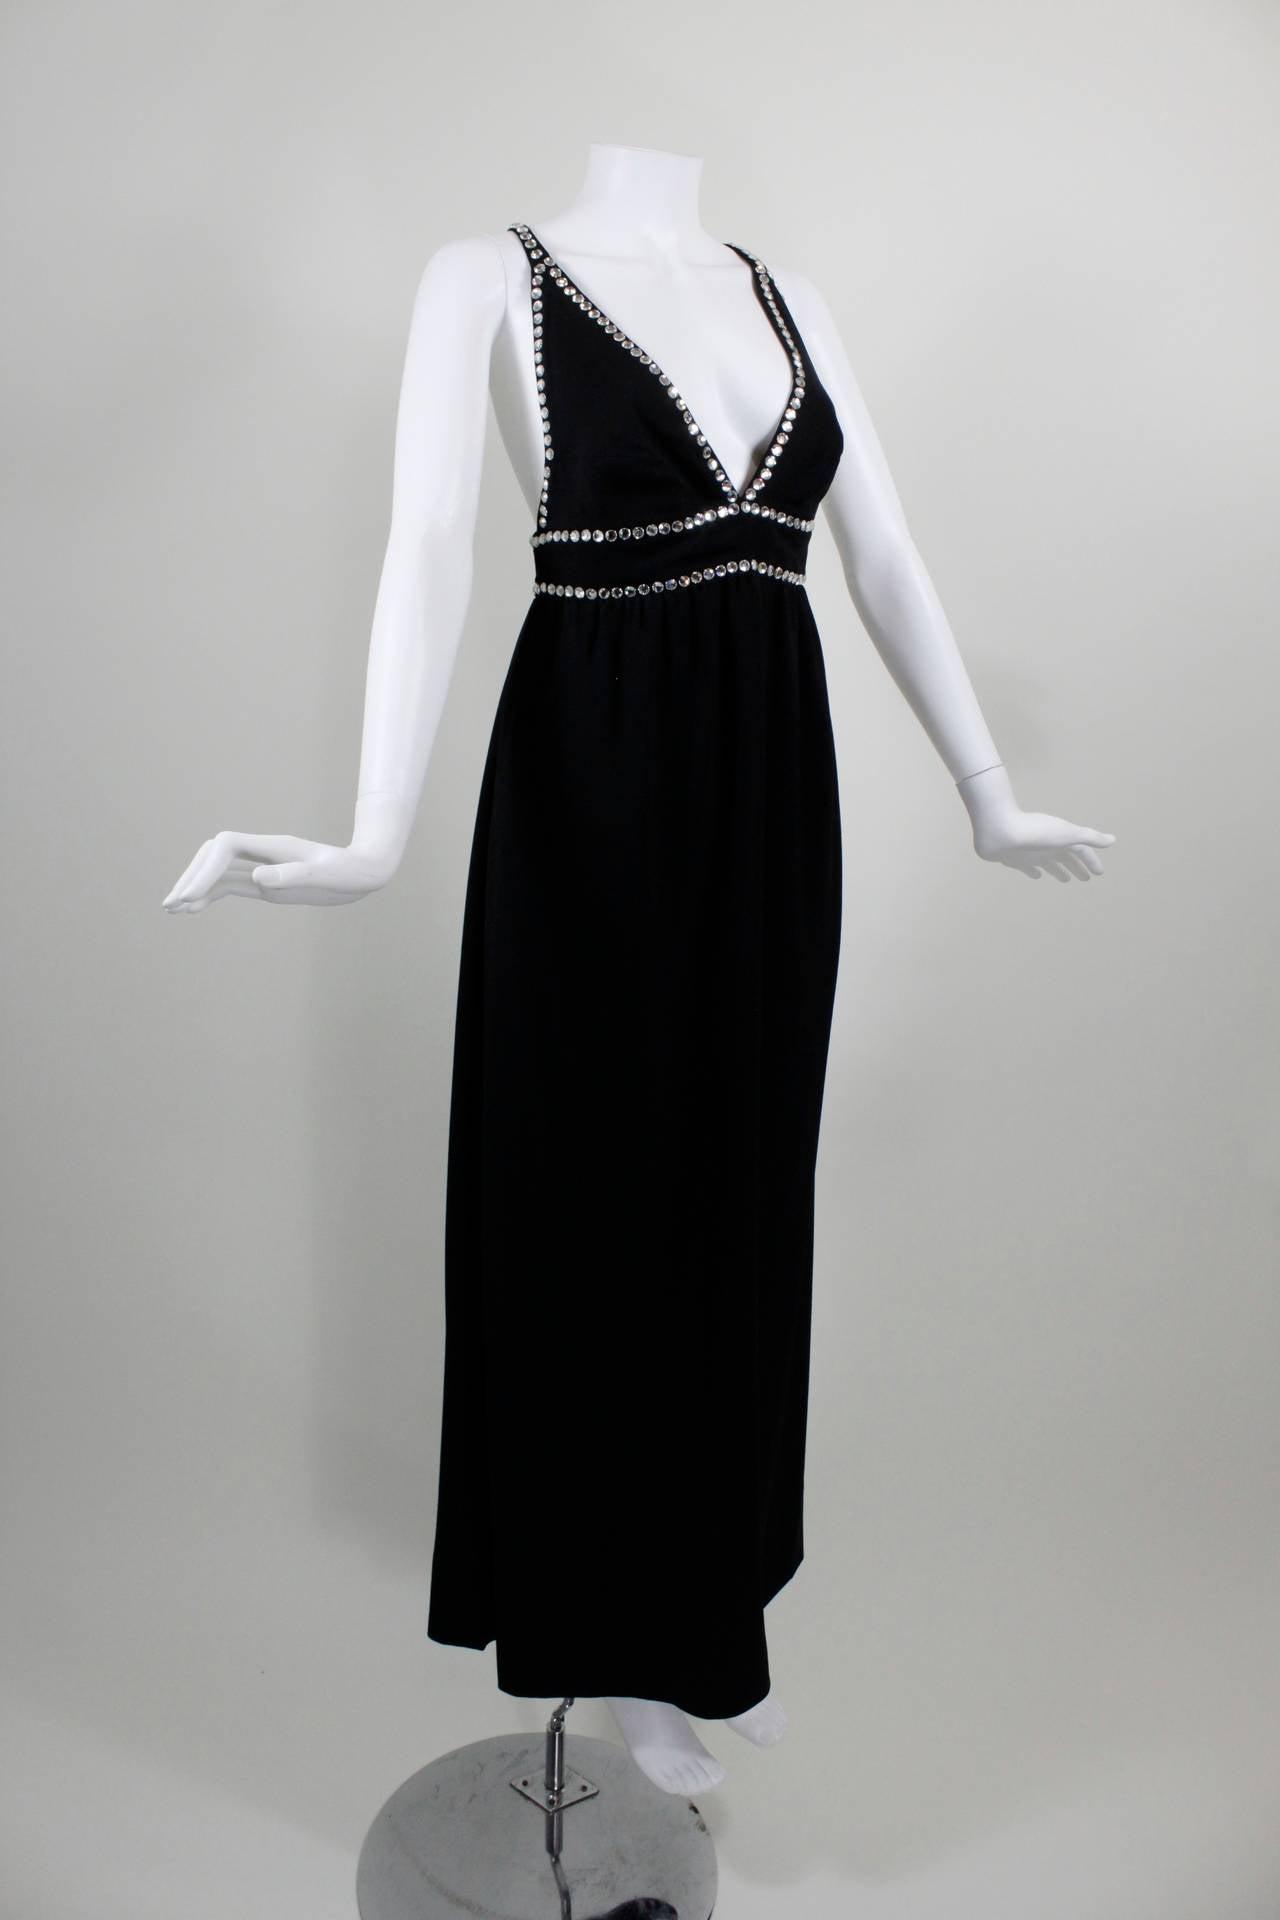 Oscar de La Renta Black Evening Gown with Oversize Rhinestone Embellishment 3